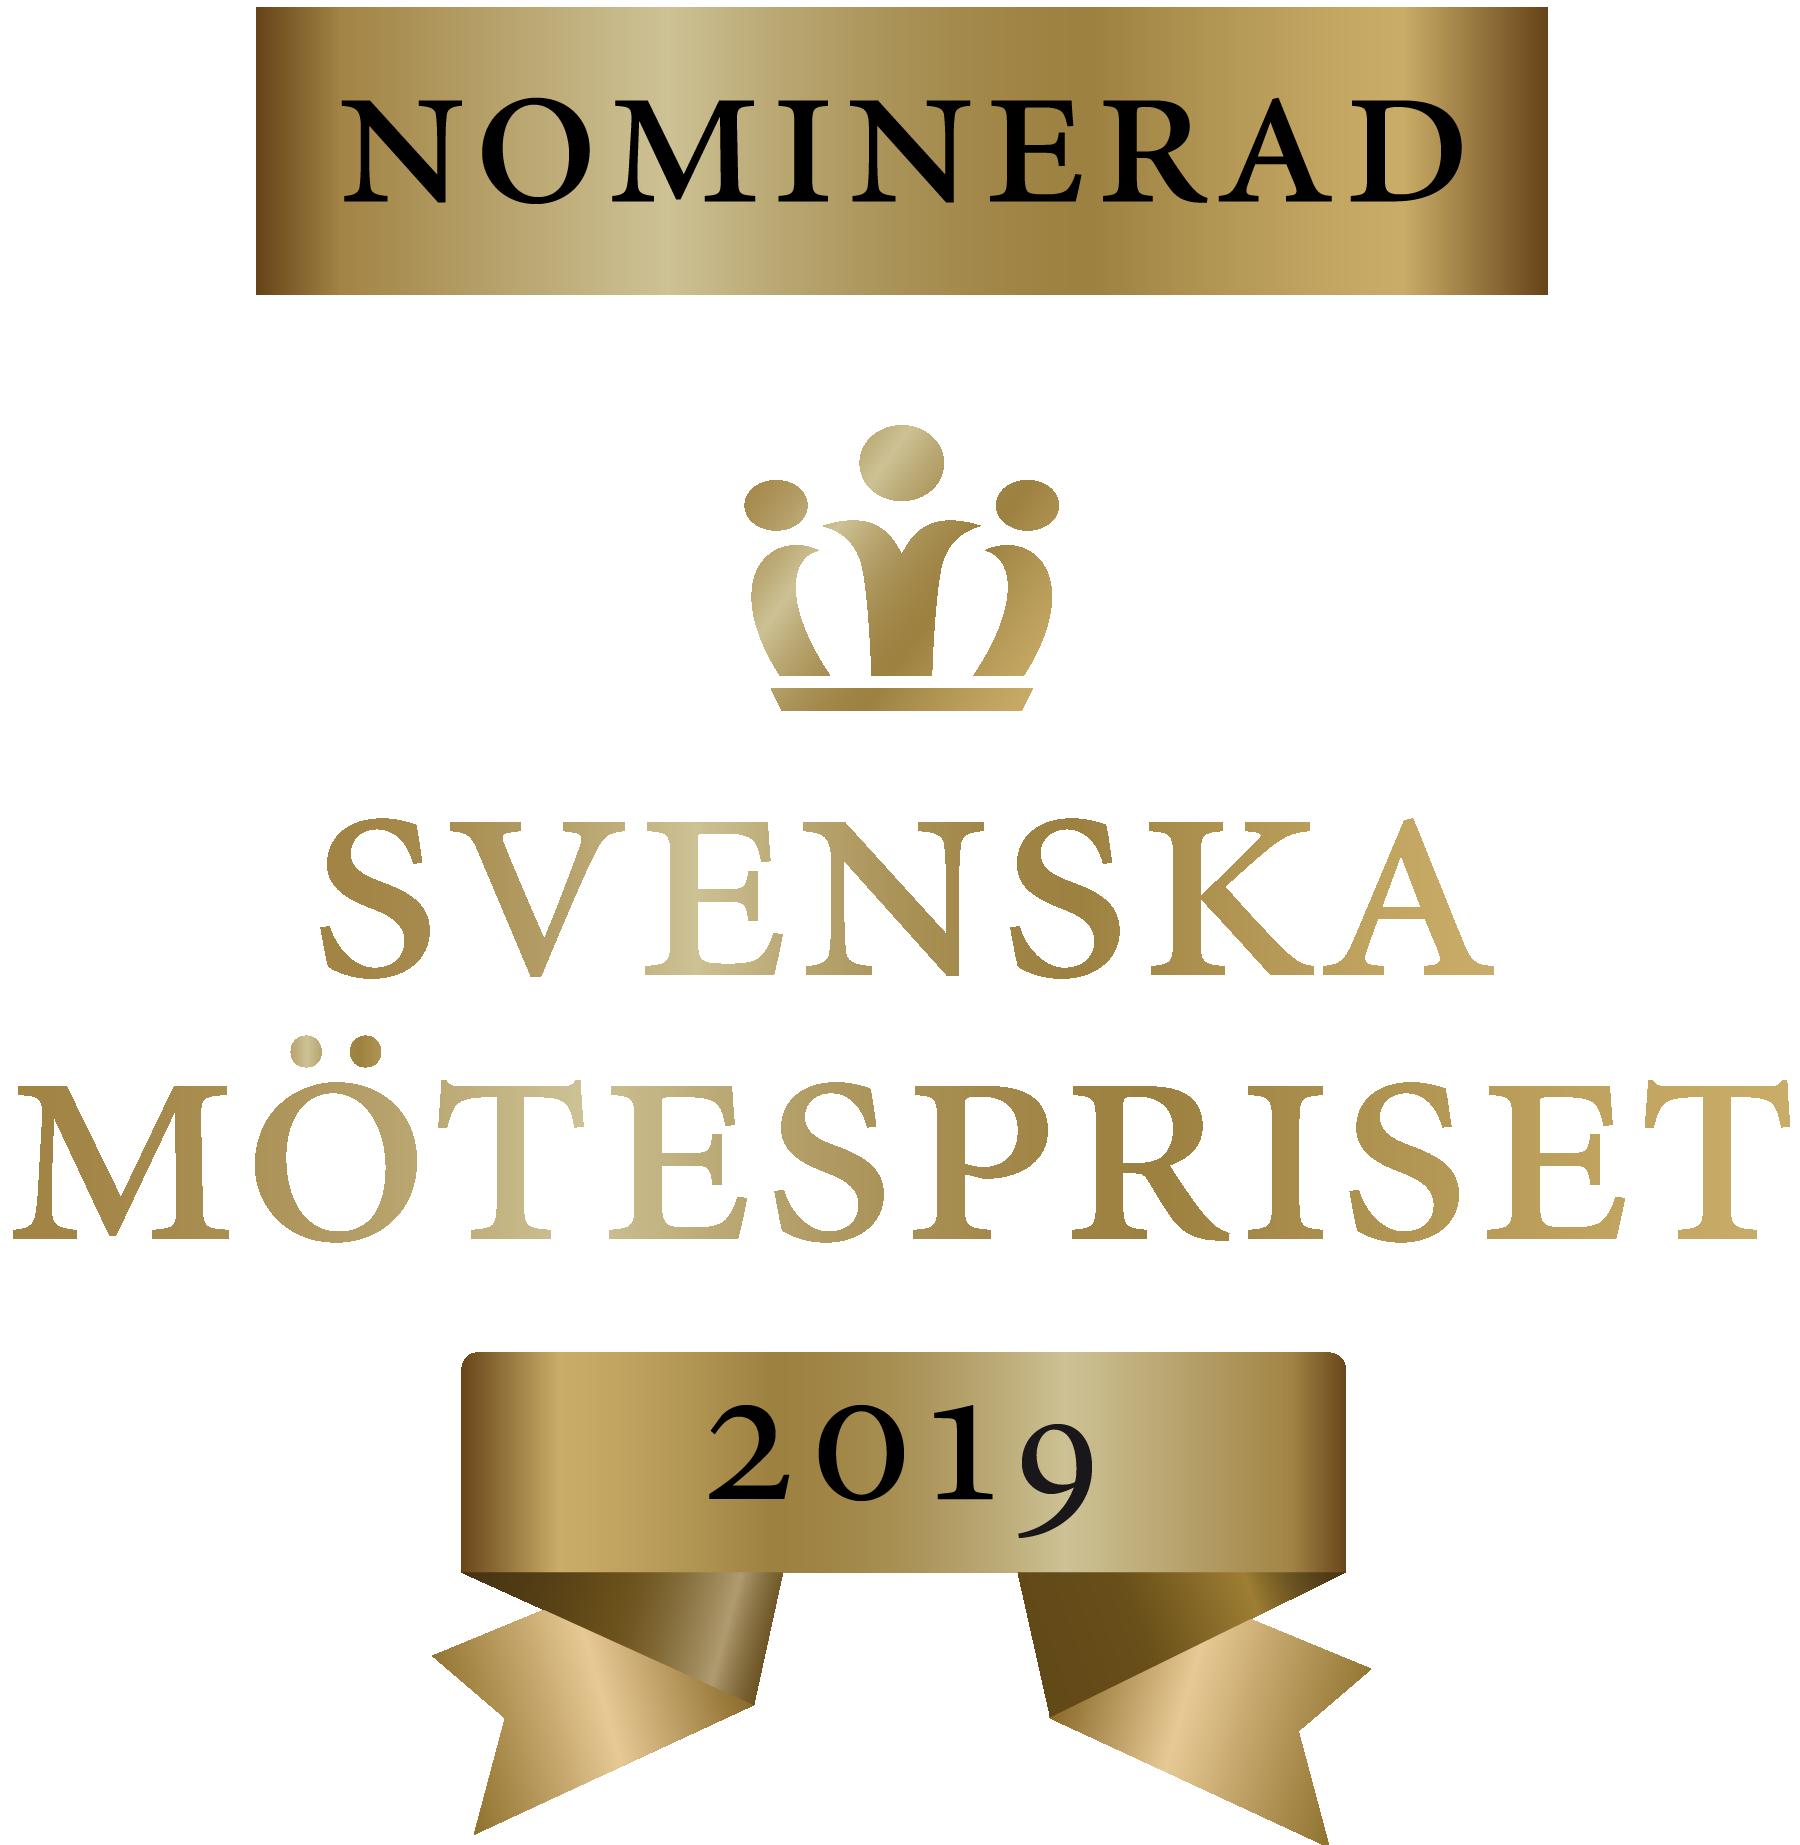 Svenska mötespriset 2019